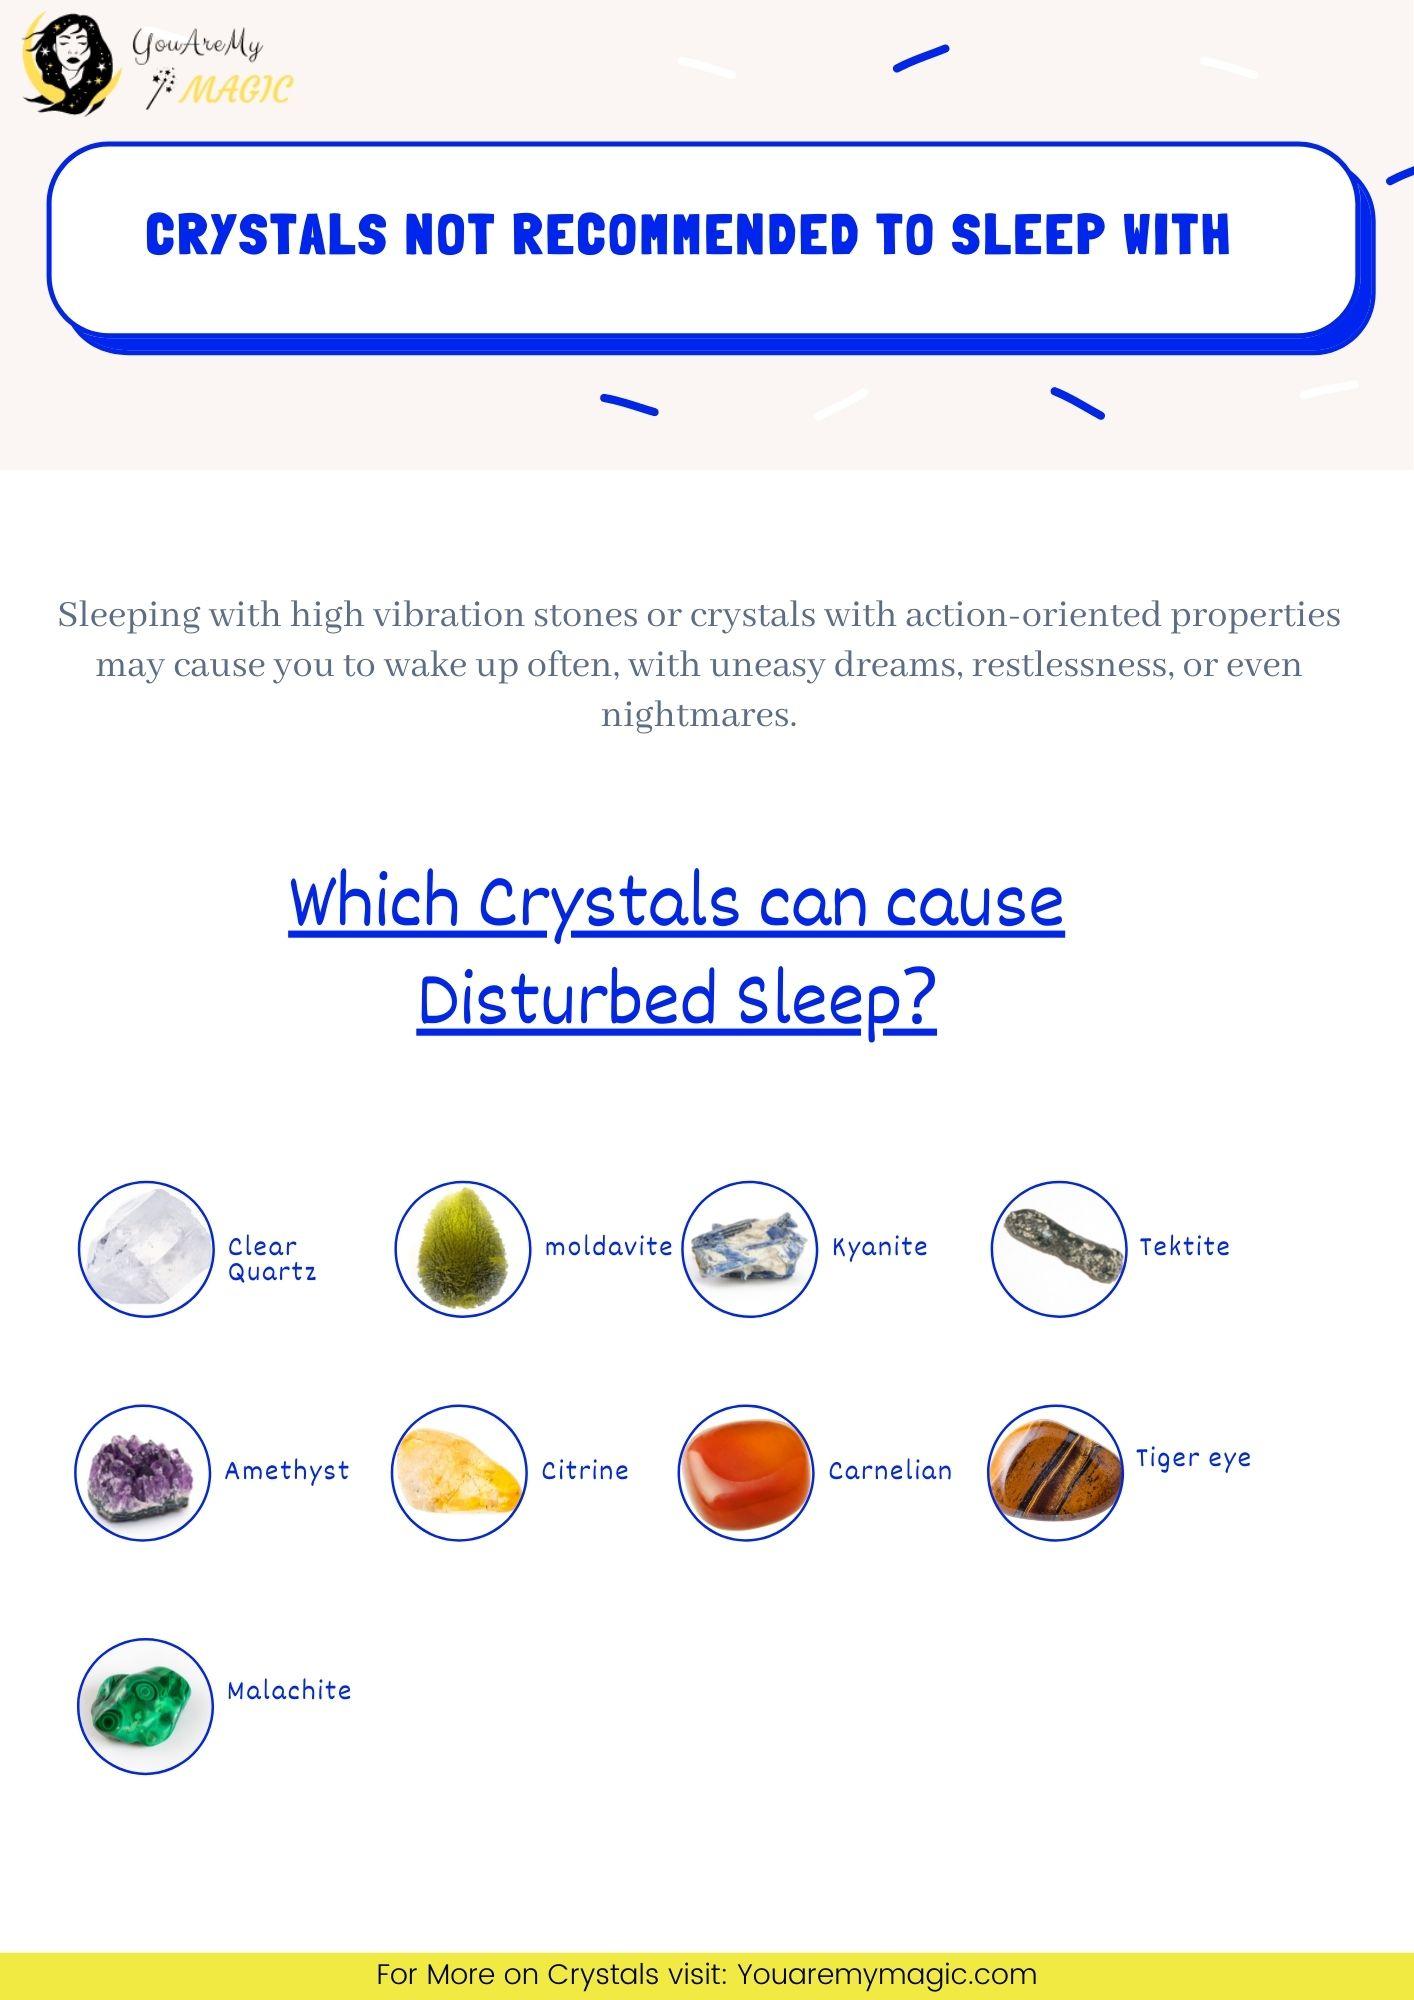 Side Effect - Disturbed Sleep